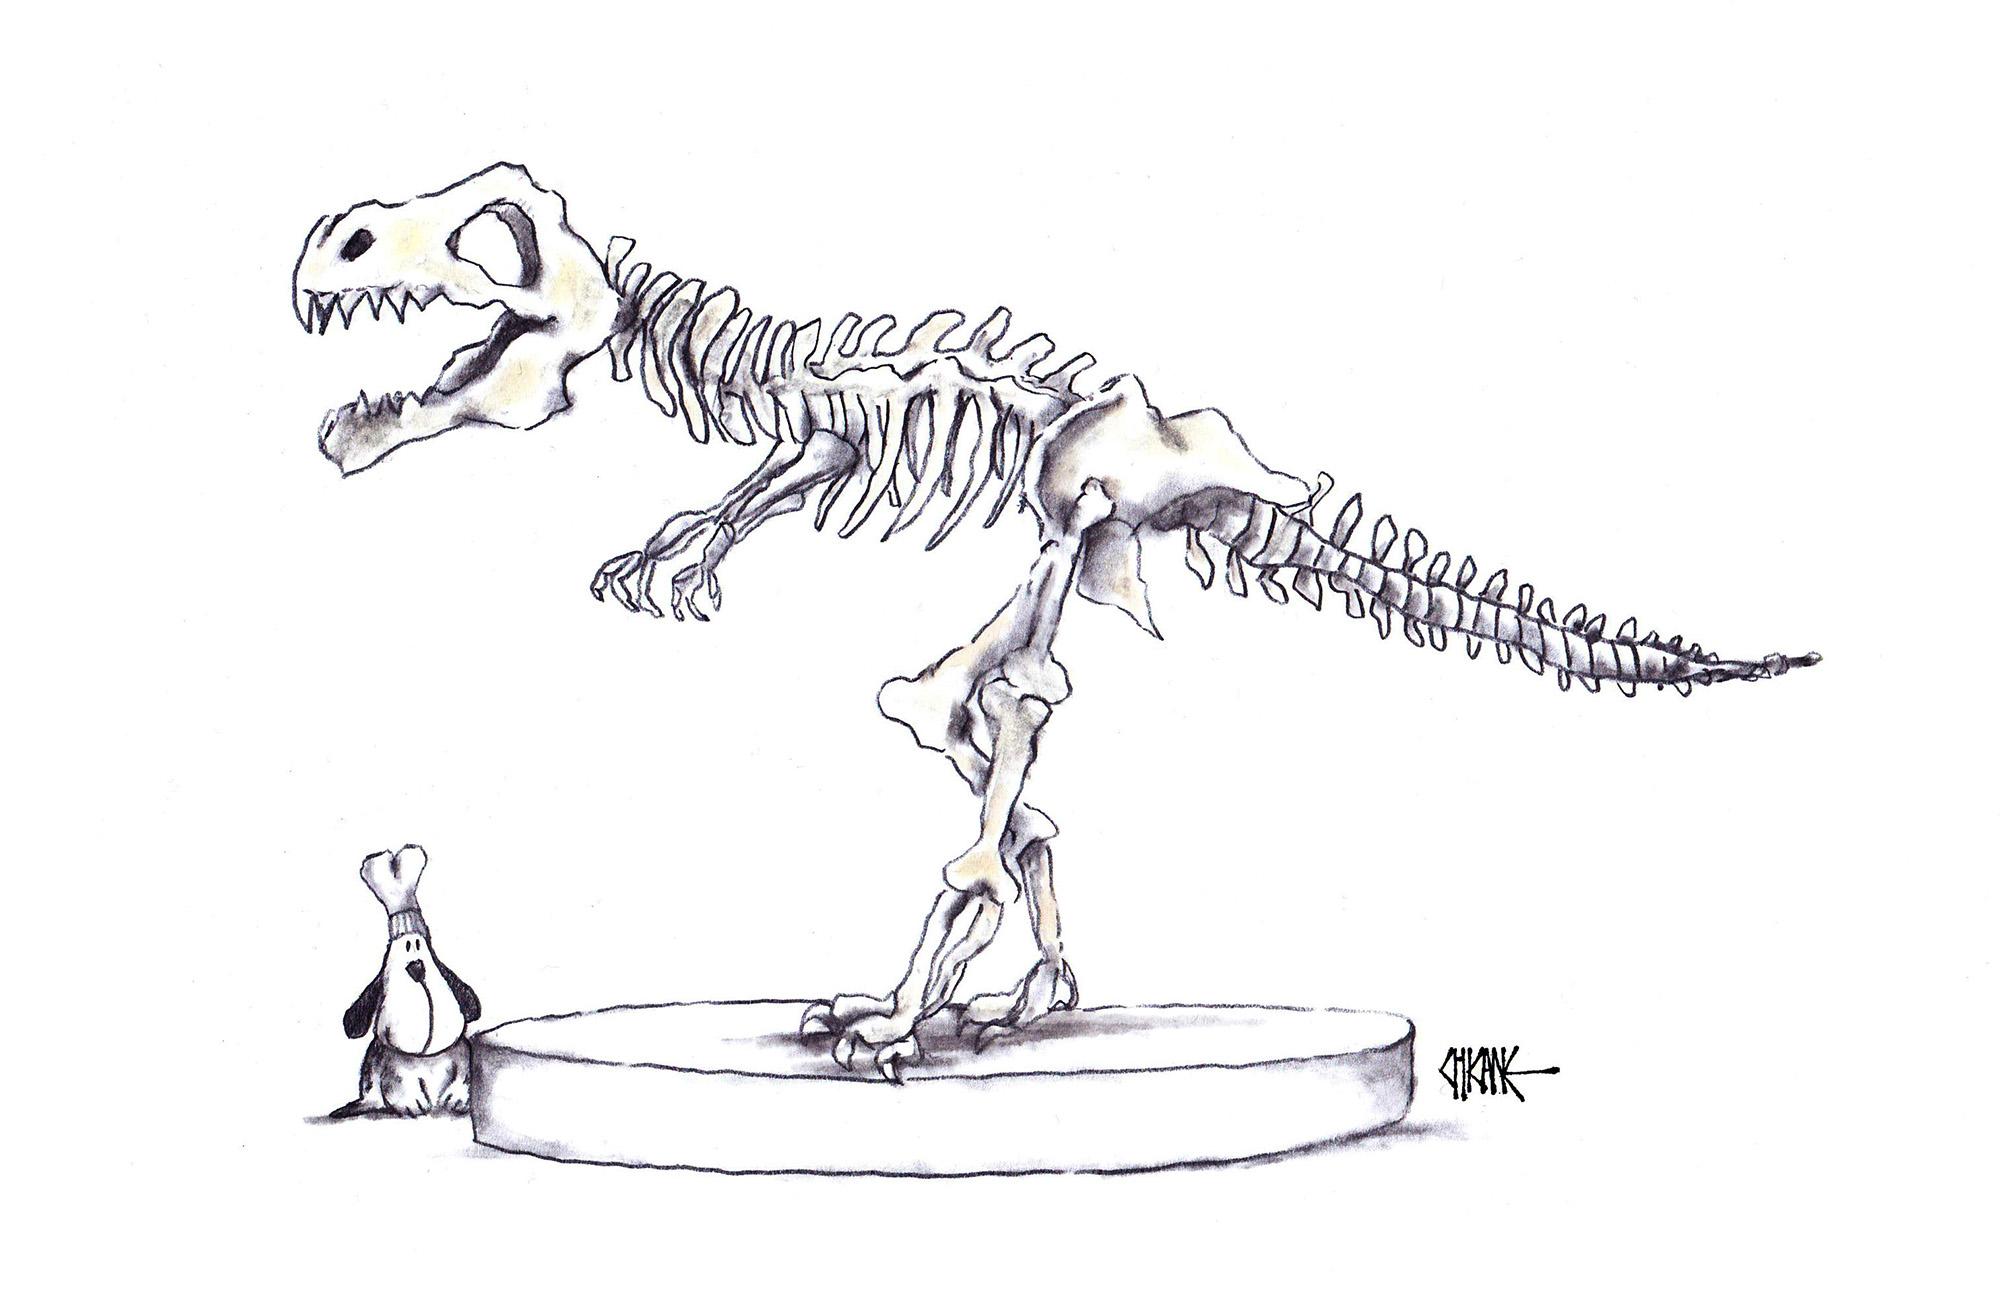 Dog chef with dinosaur bones cartoon by Chicane